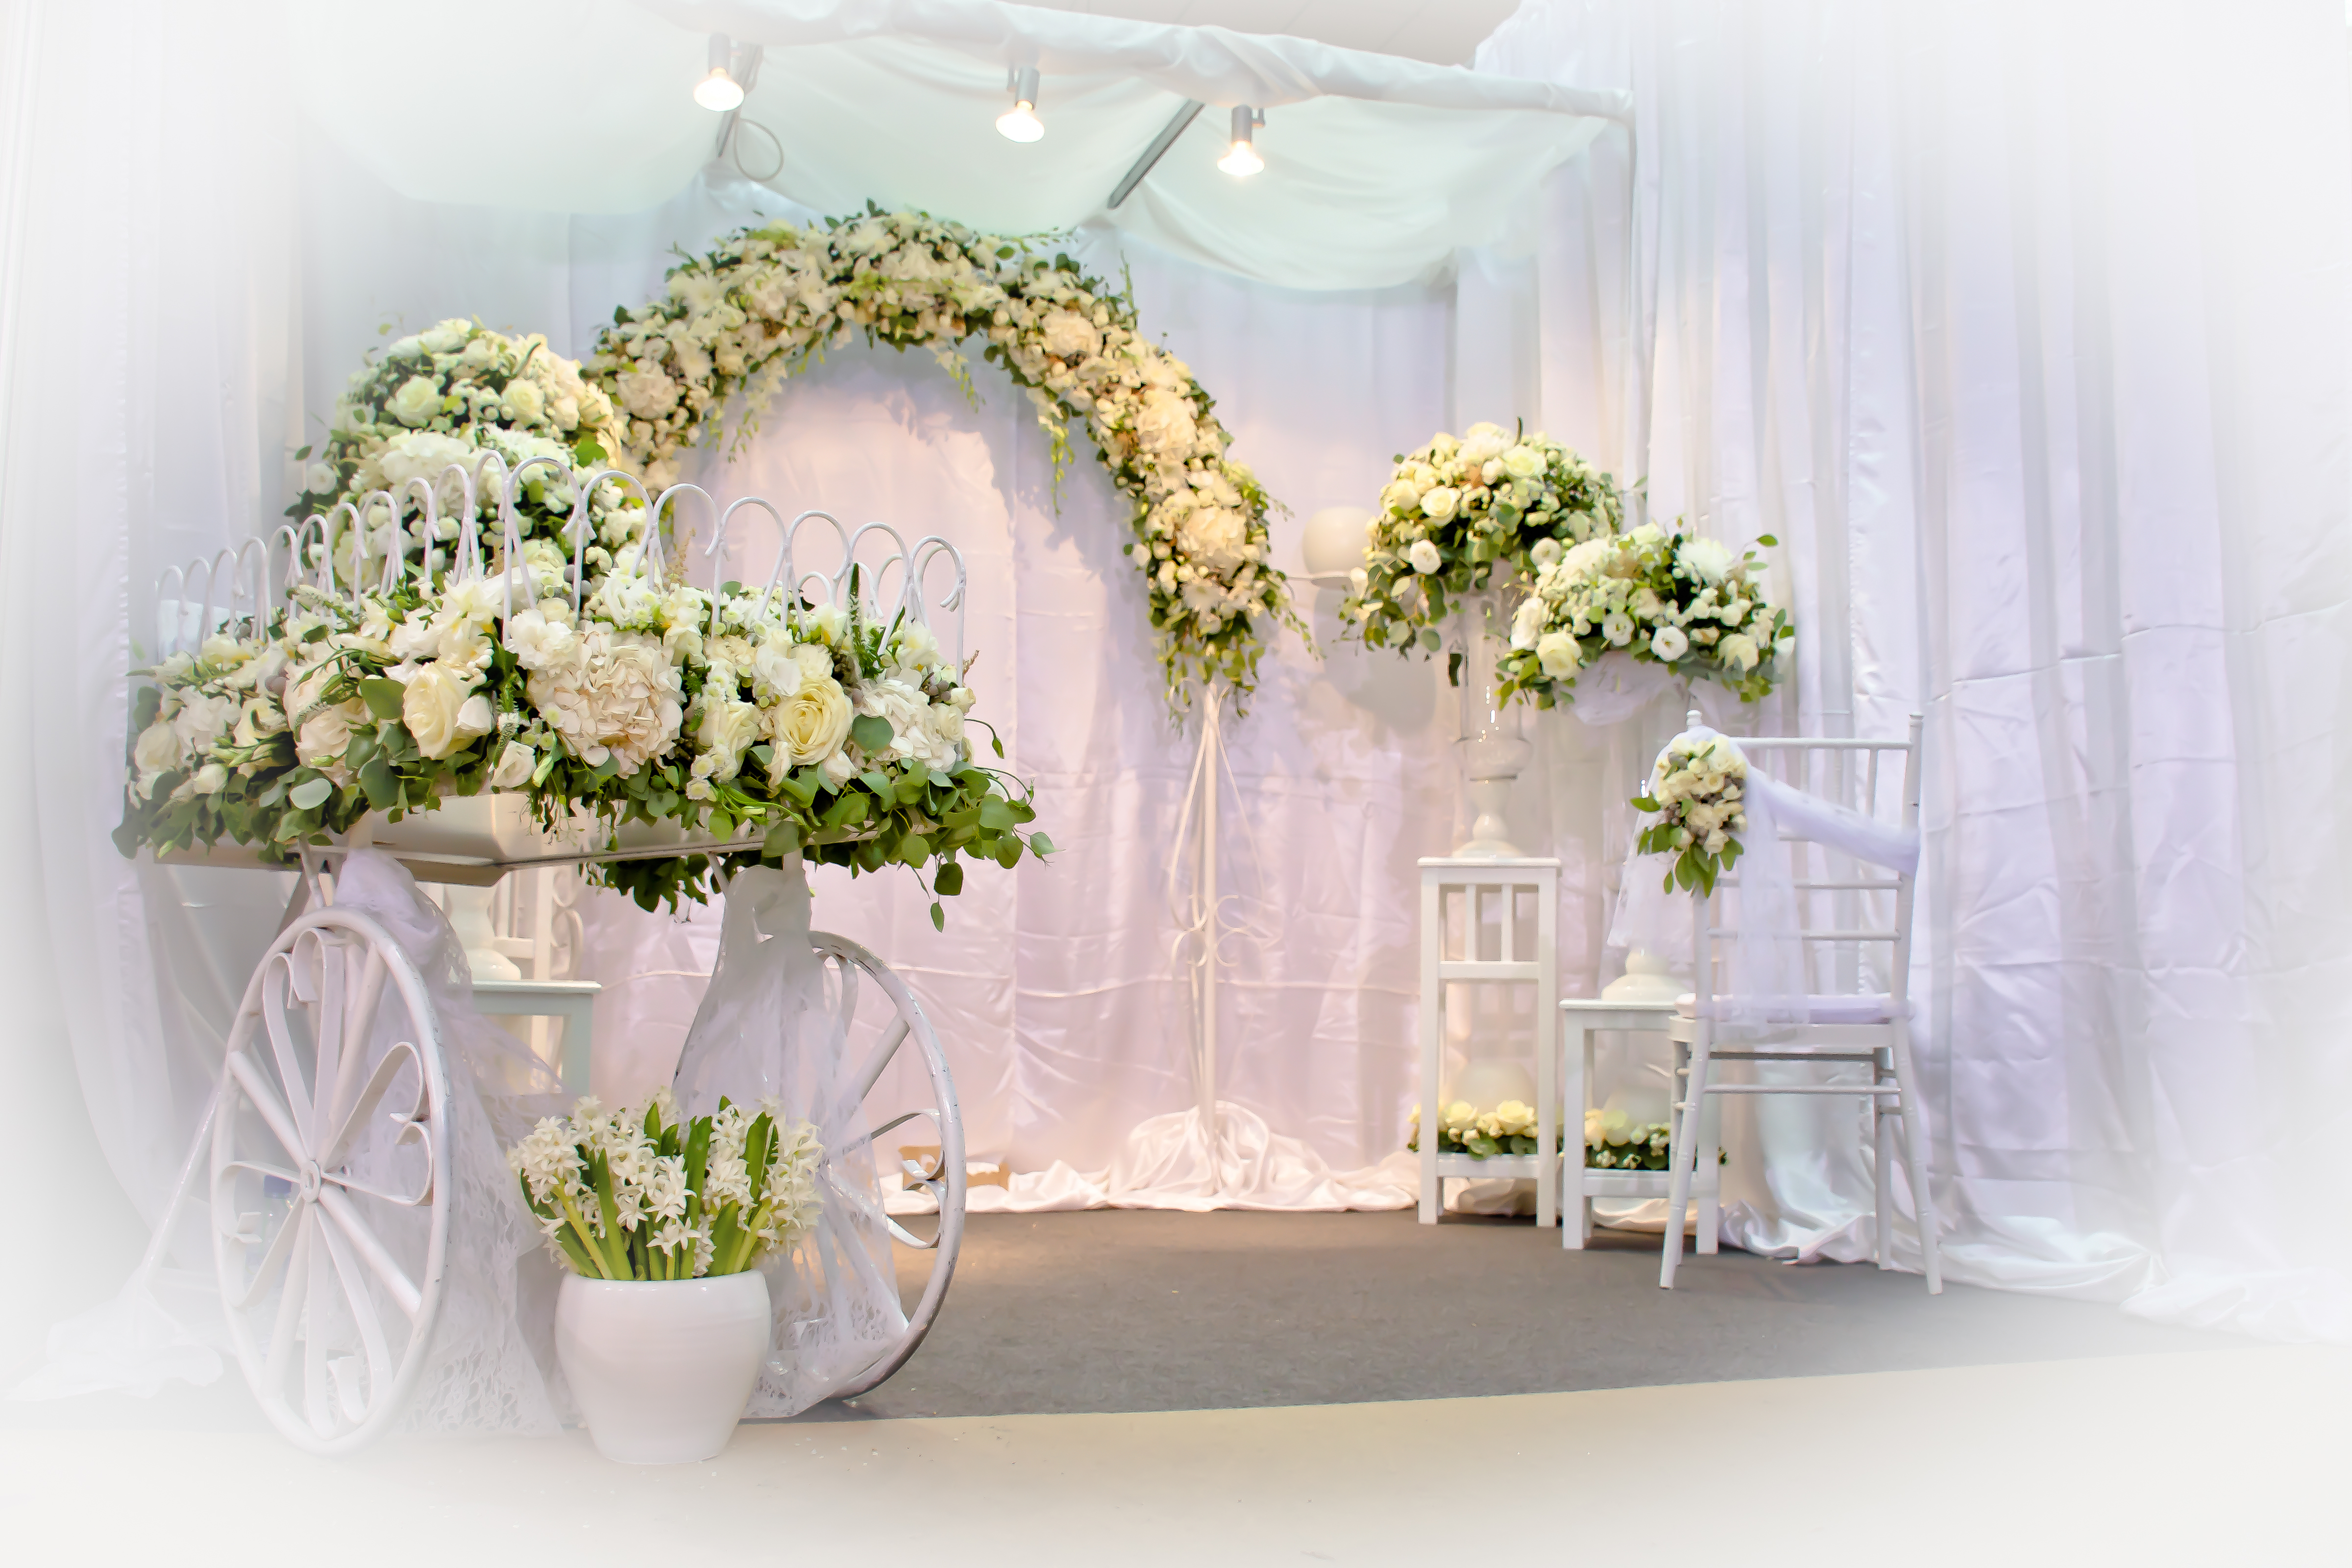 eb152aee62e9 διακόσμηση γάμου κύπρος Archives • Casa Di Fiori